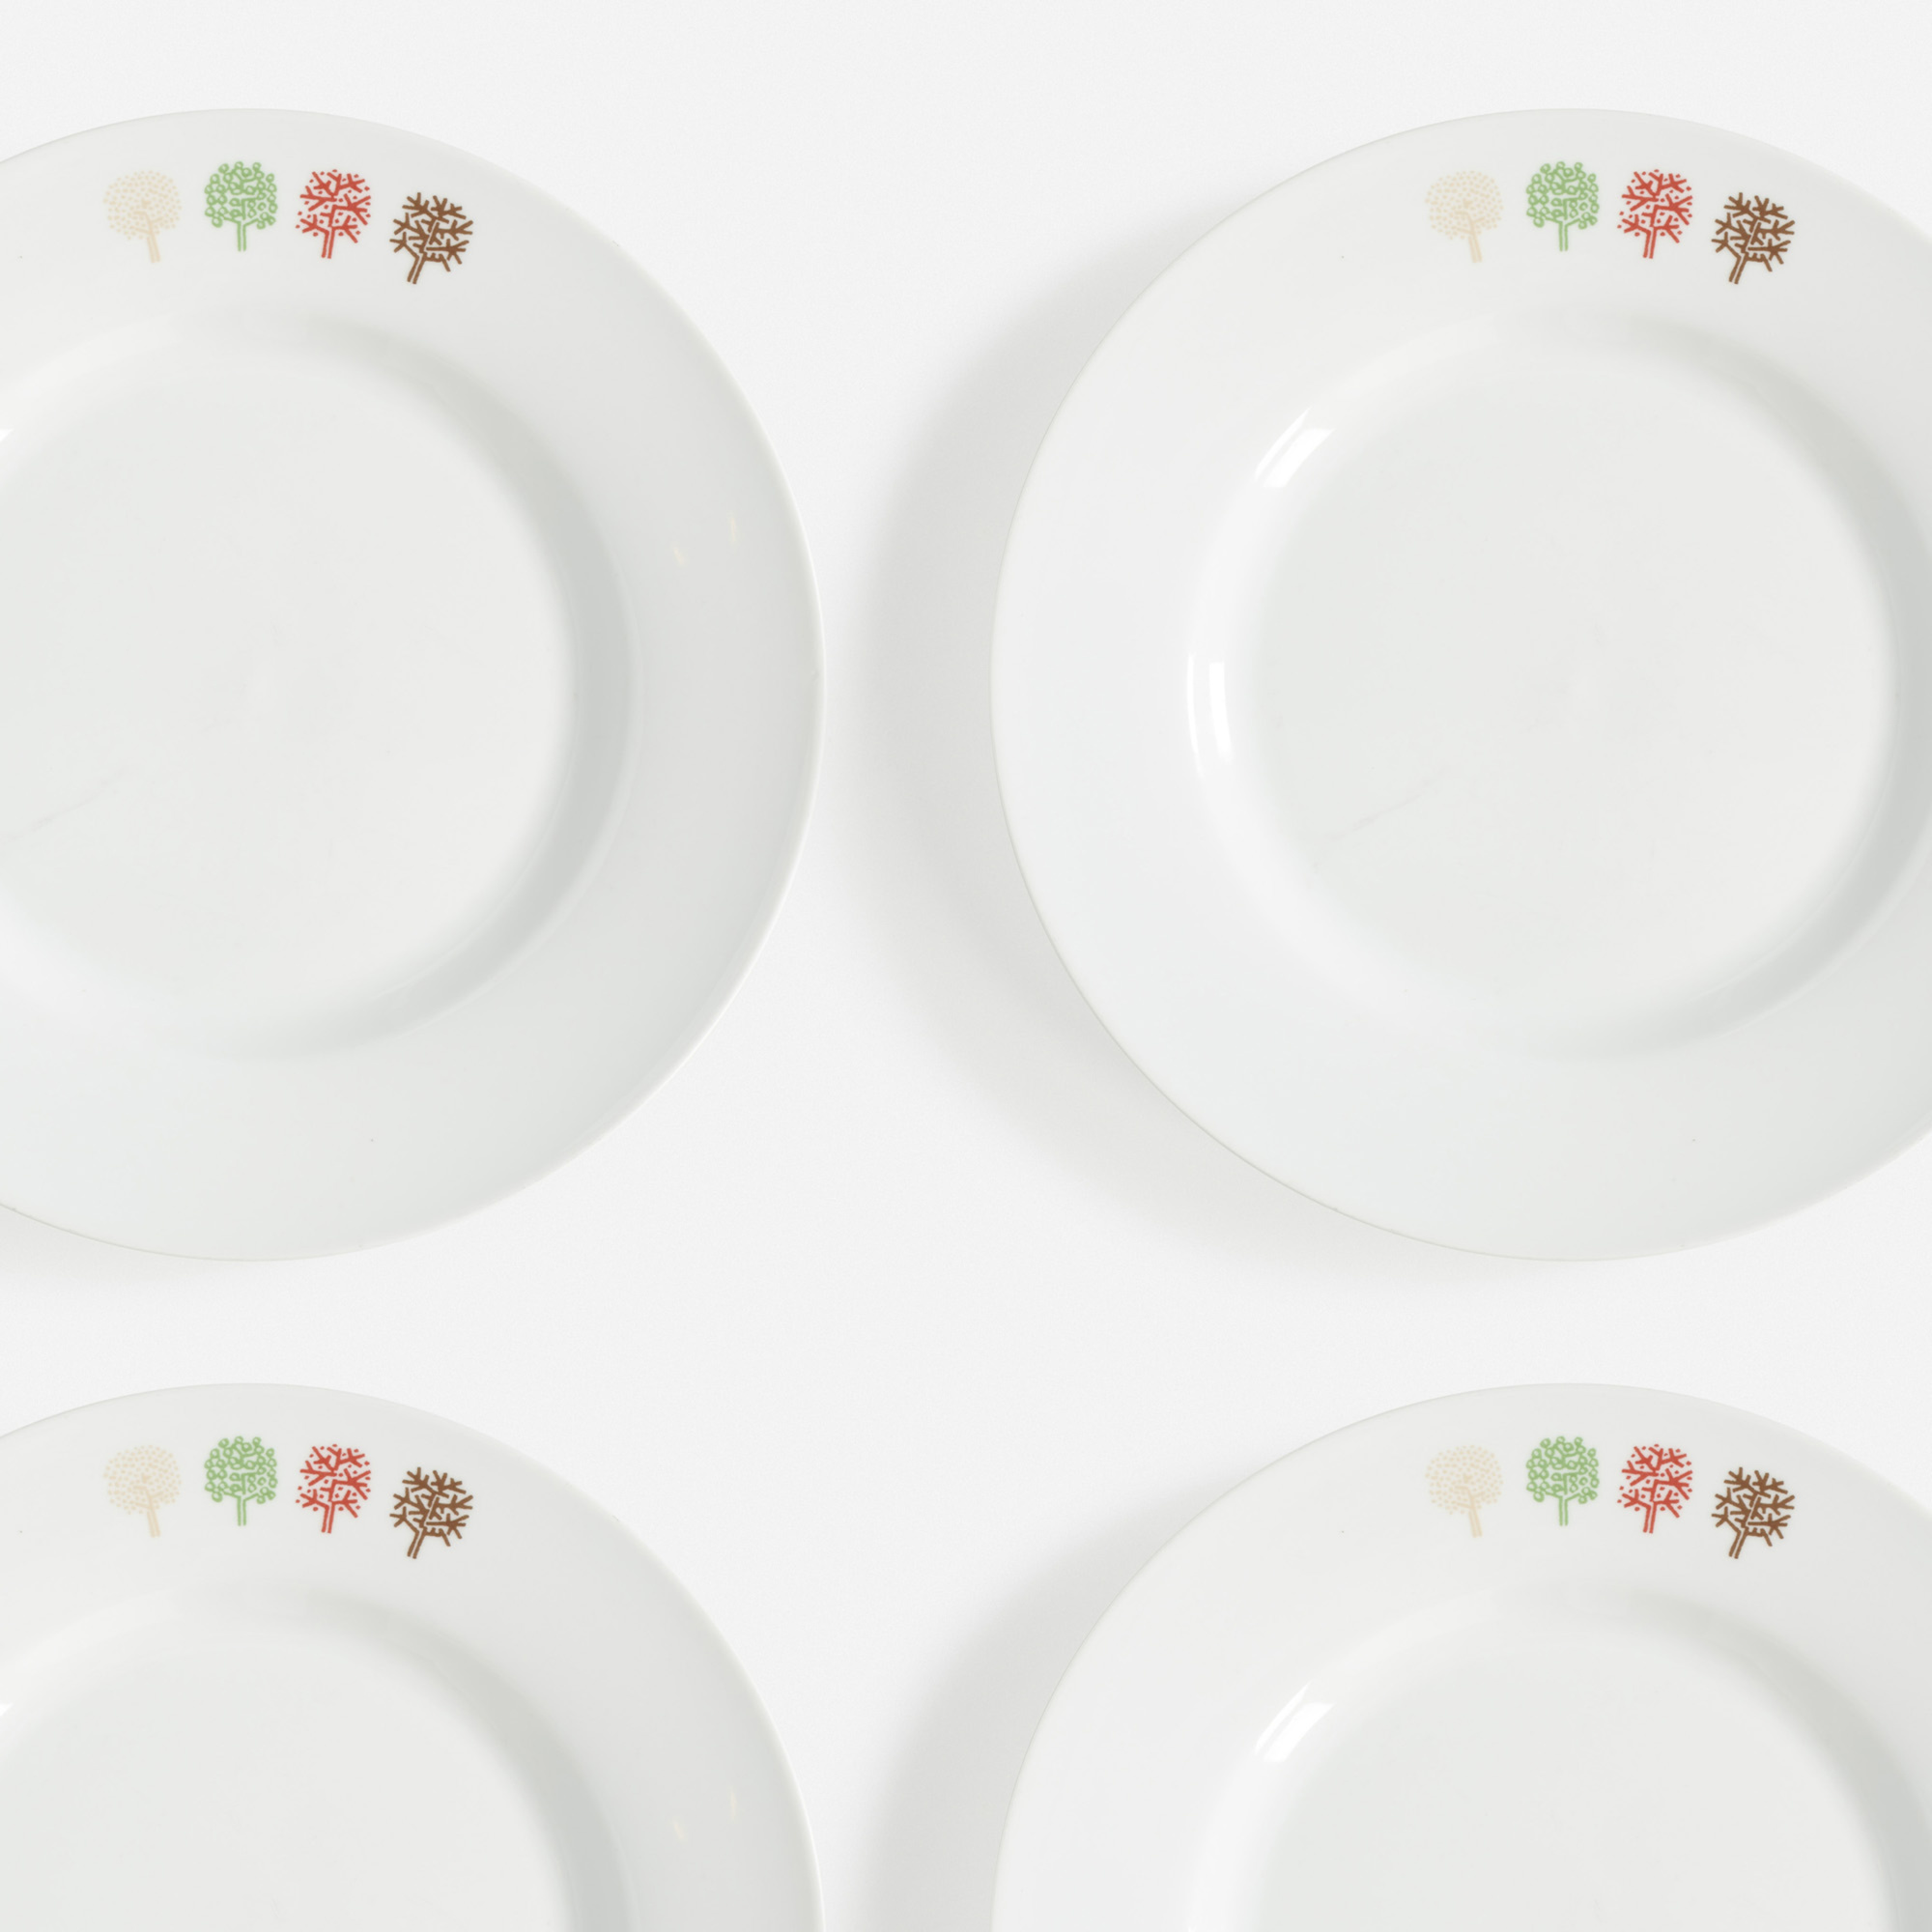 736:  / Four Seasons plates, set of twelve (1 of 1)